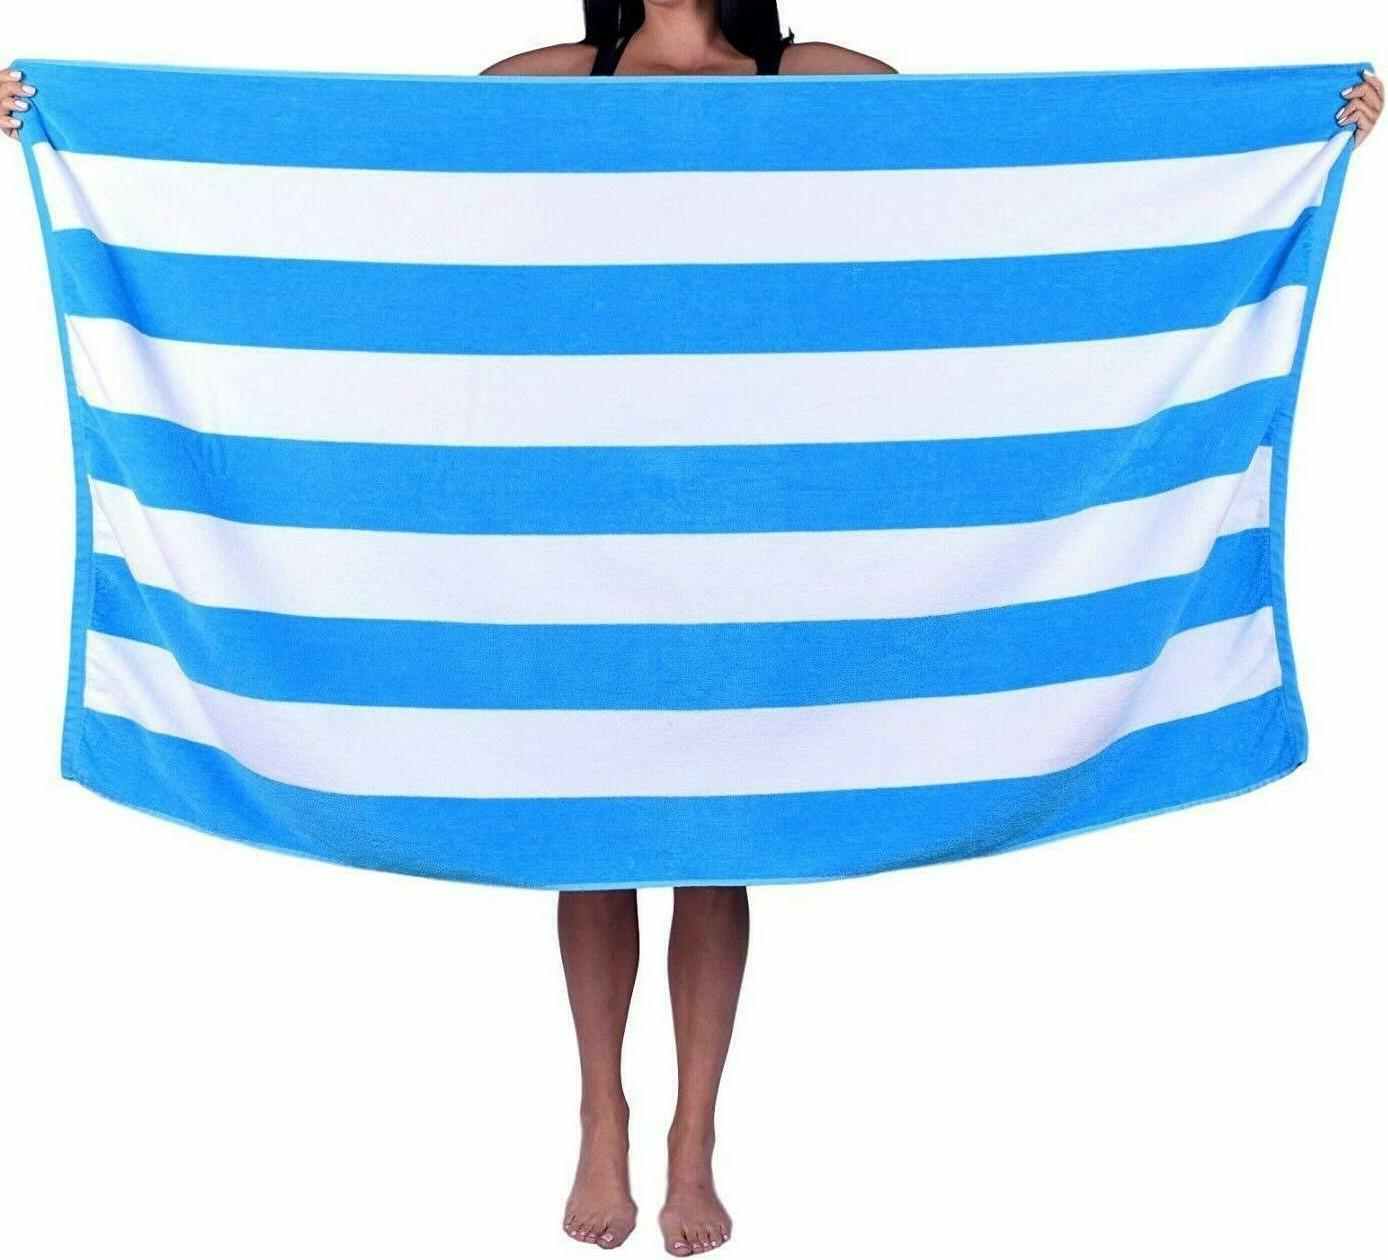 Extra Large Towel Soft Absorbent 35 x GEORGIA TOWELS